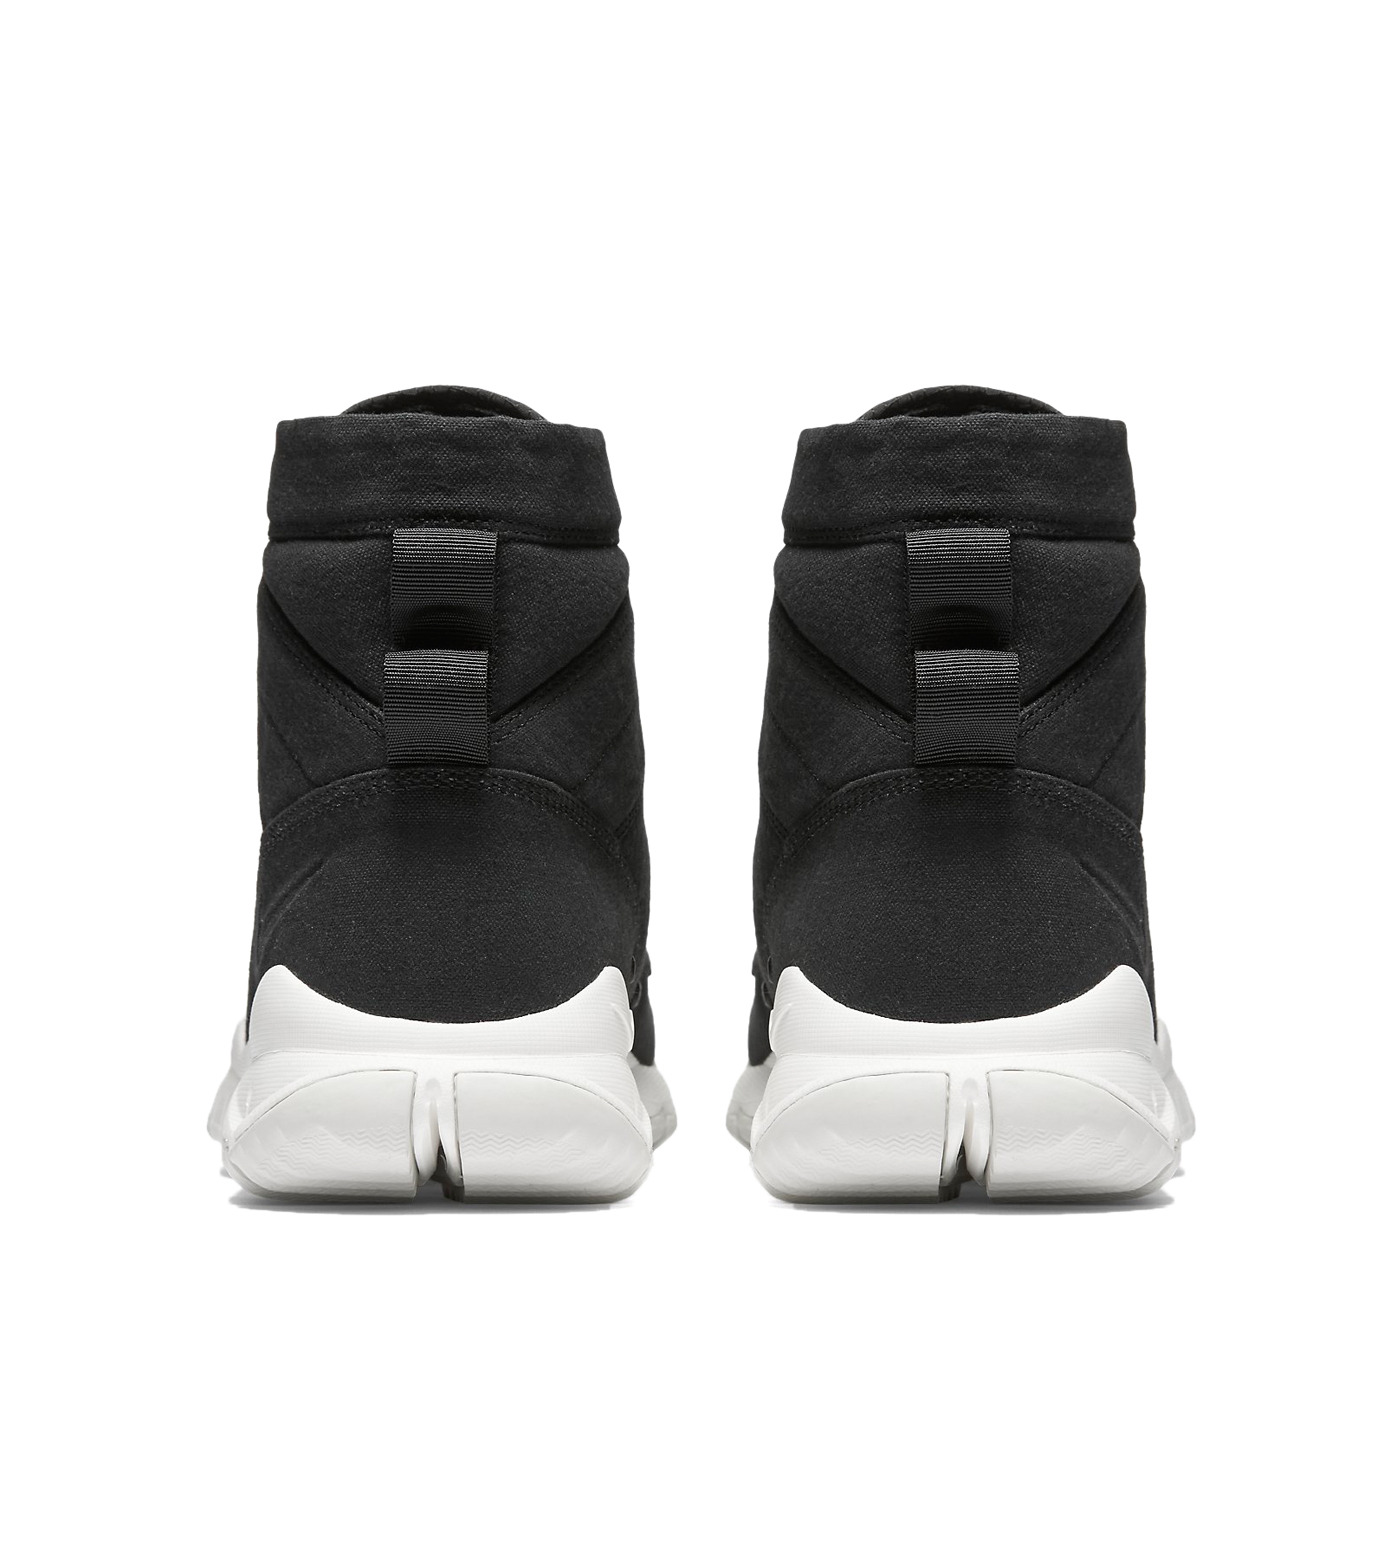 NIKE(ナイキ)のSFB FIELD 6 CANVAS NSW-BLACK(シューズ/shoes)-844577-001-13 拡大詳細画像5